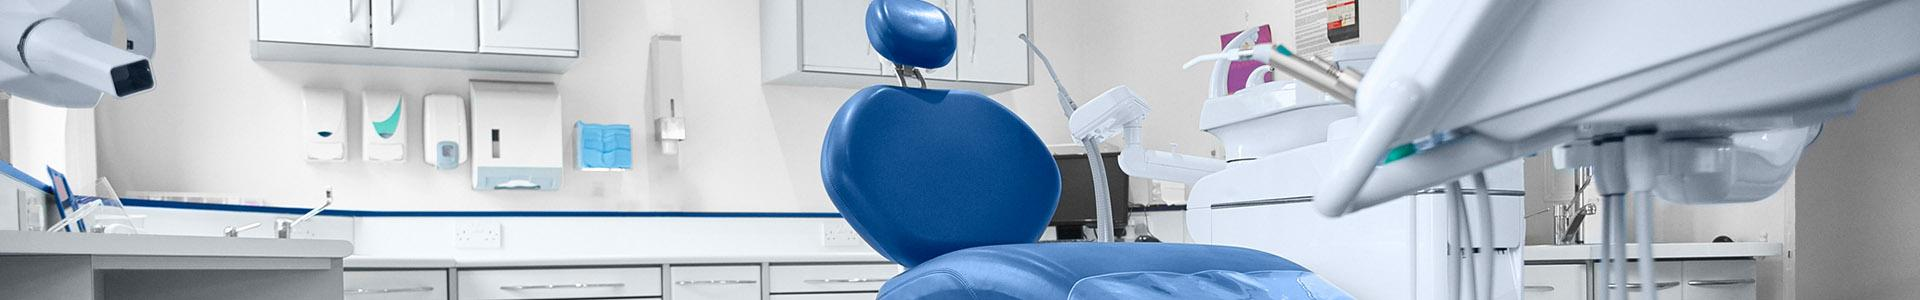 Fotel stomatologizcny